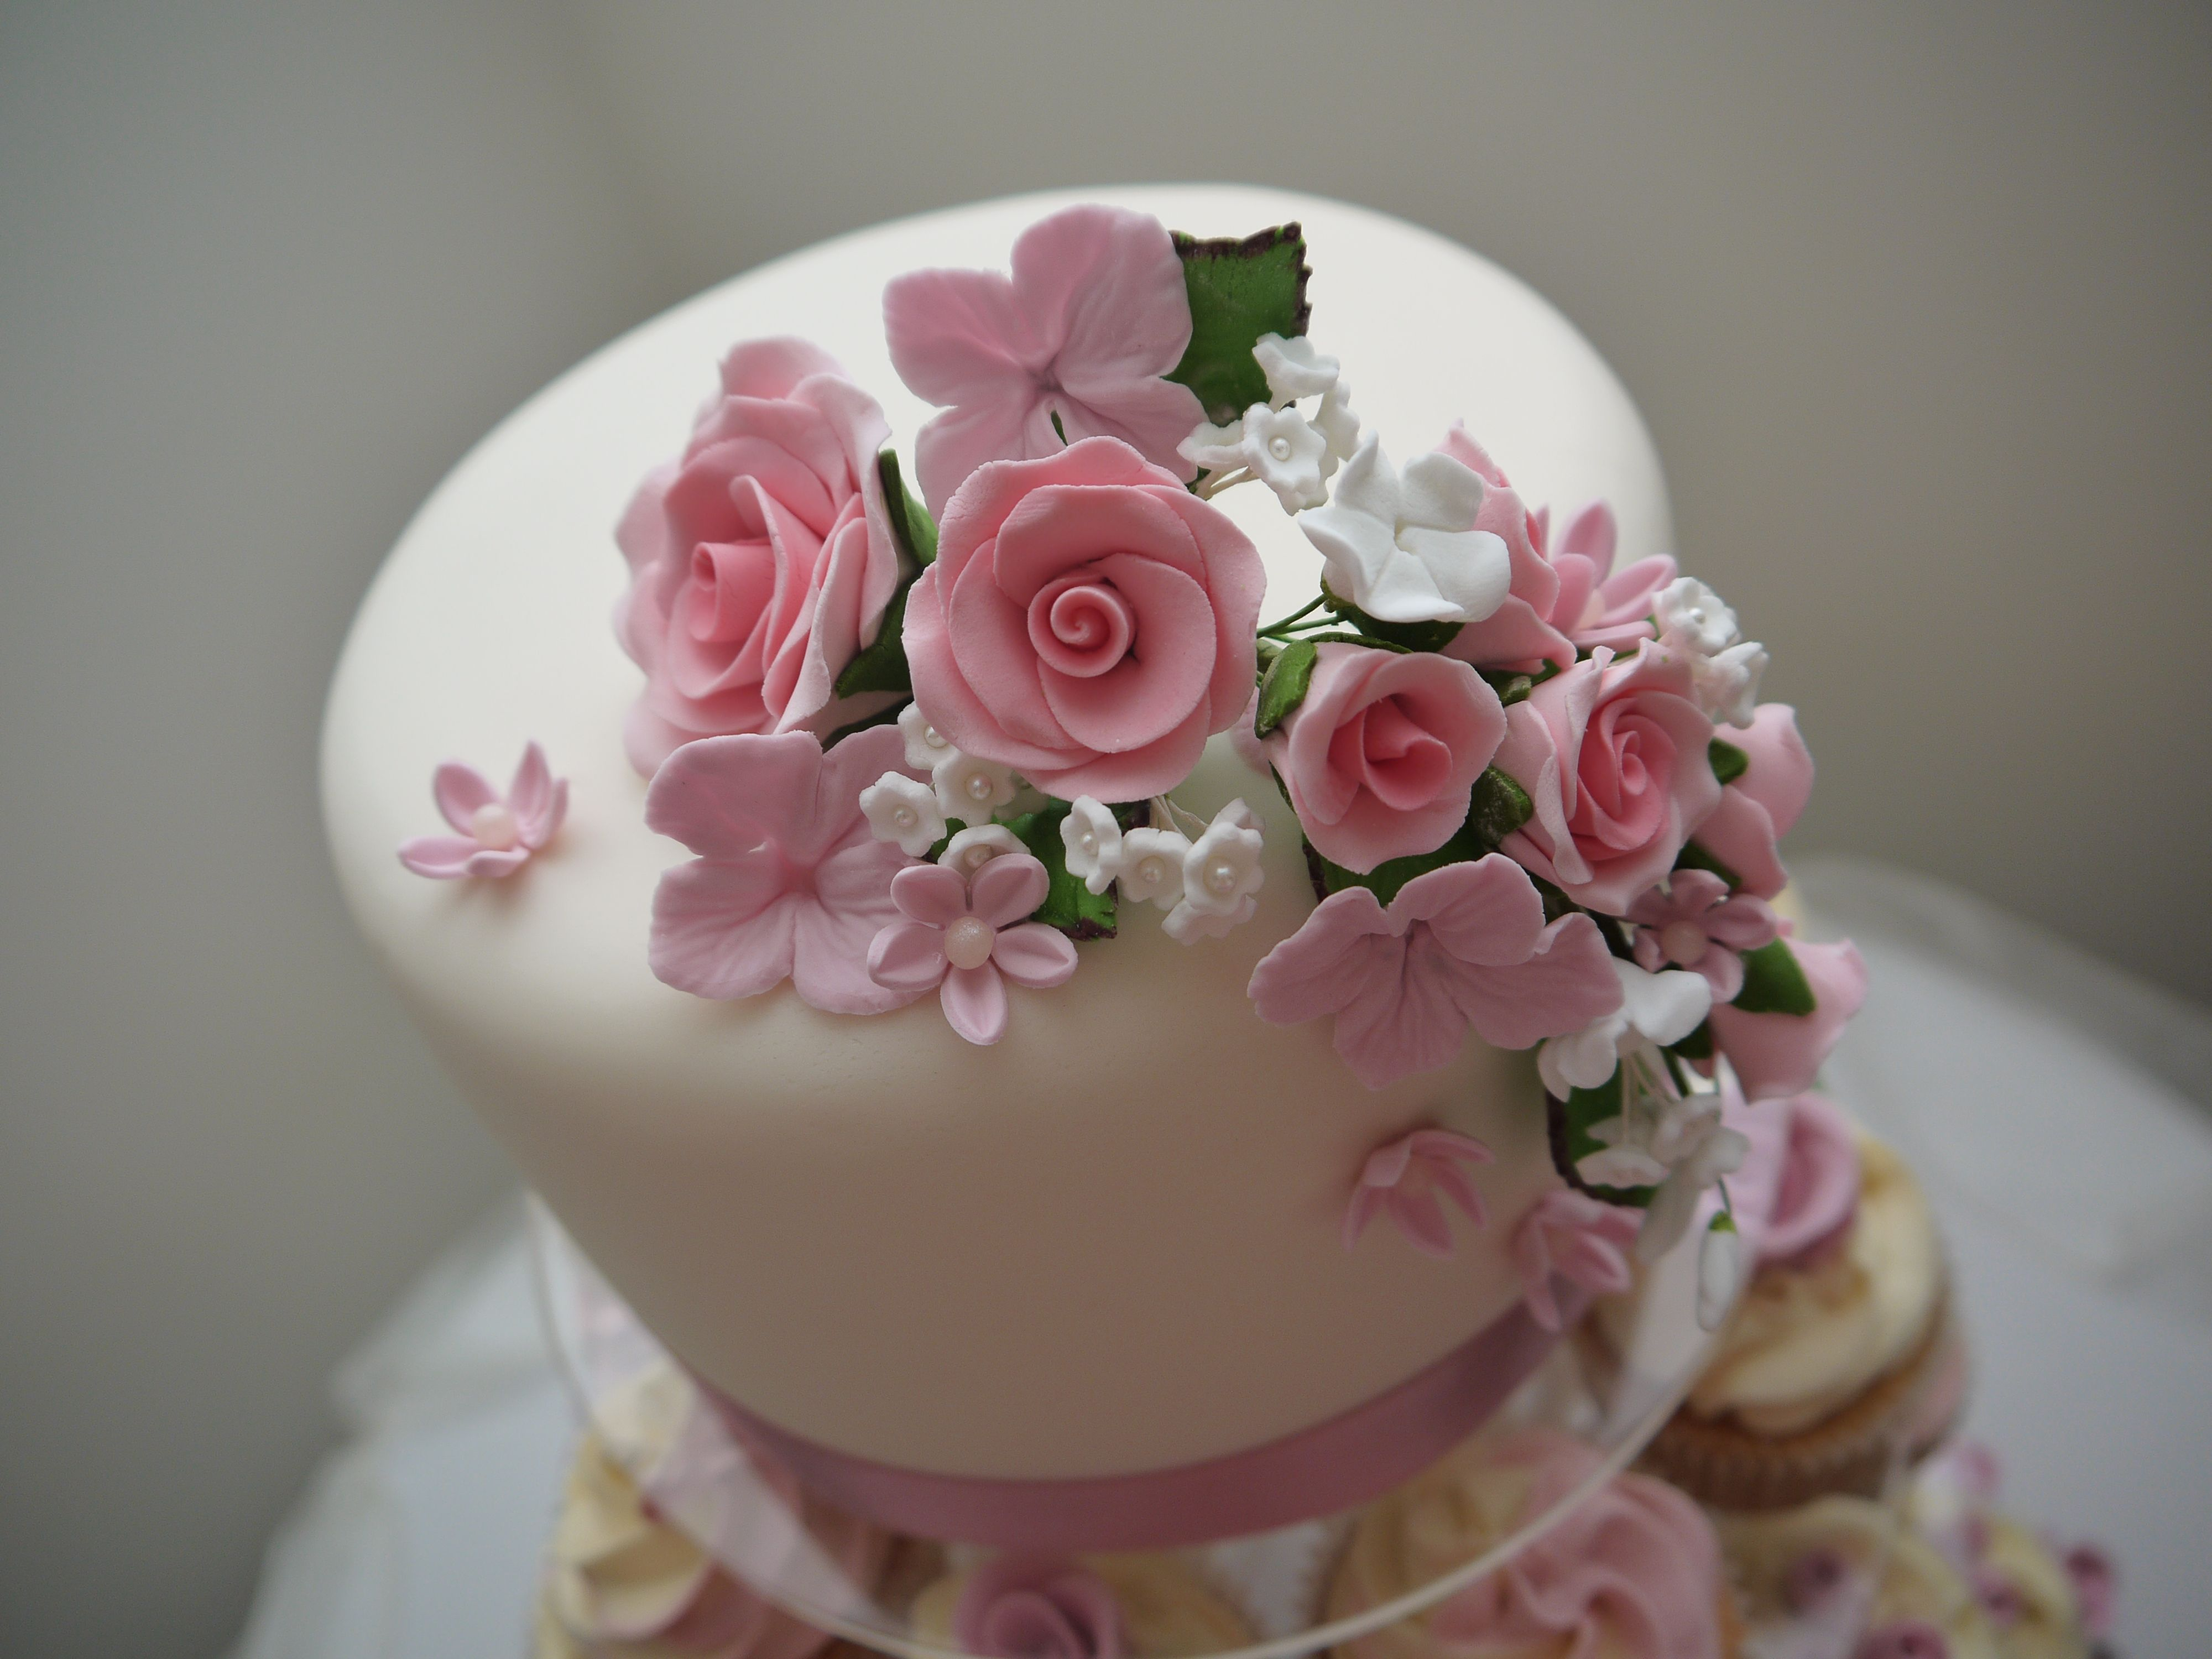 Floral Top Cake by Love Cupcake & Cheri Bakewells Essex   www.love-cupcake.co.uk